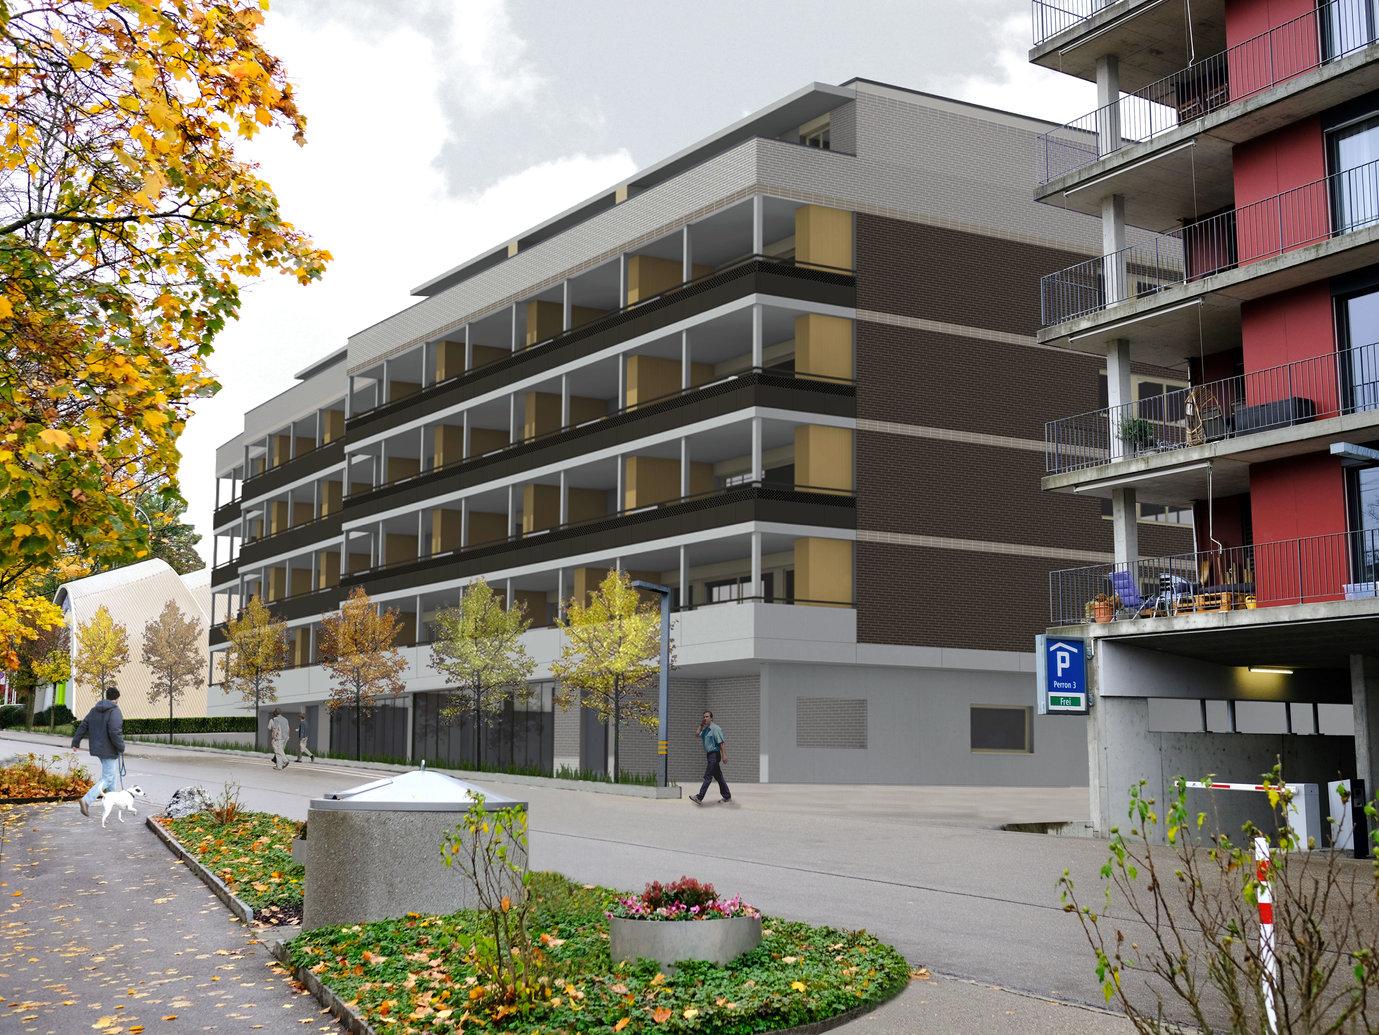 SNP Stadtbühl Gossau SG | 35 Wohnungen / Erdgeschoss Gewerbe | PKTG